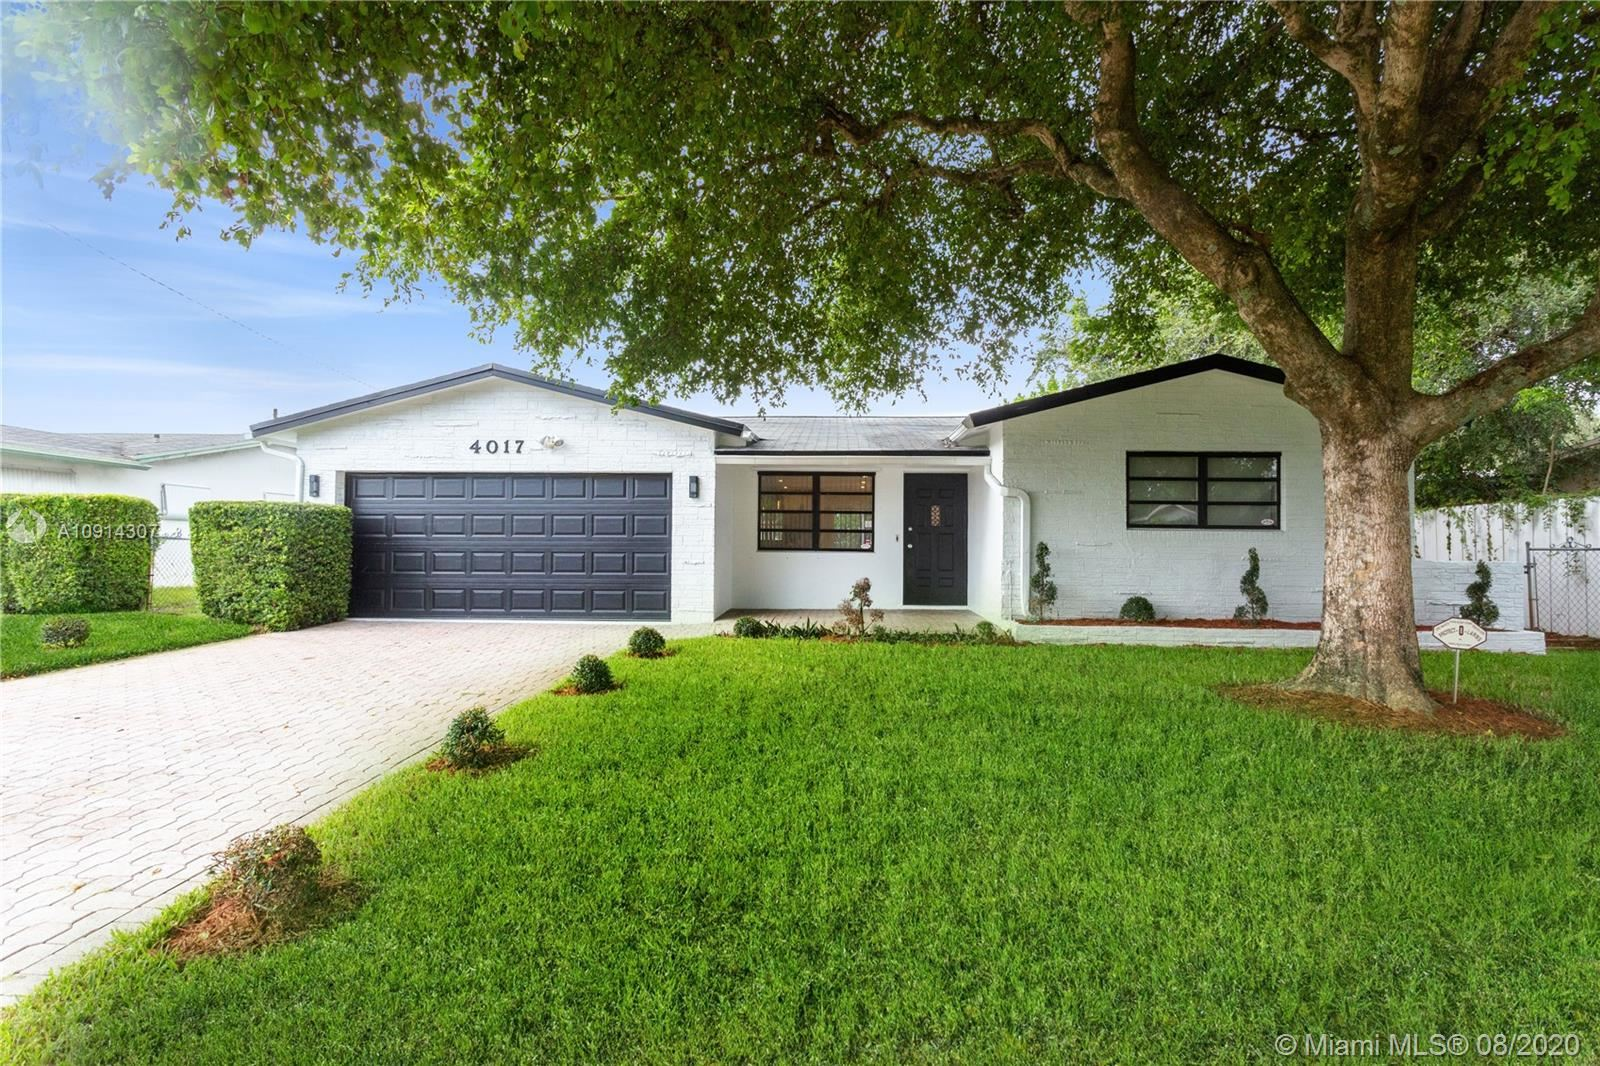 4017 Monroe St, Hollywood, FL 33021 - #: A10914307